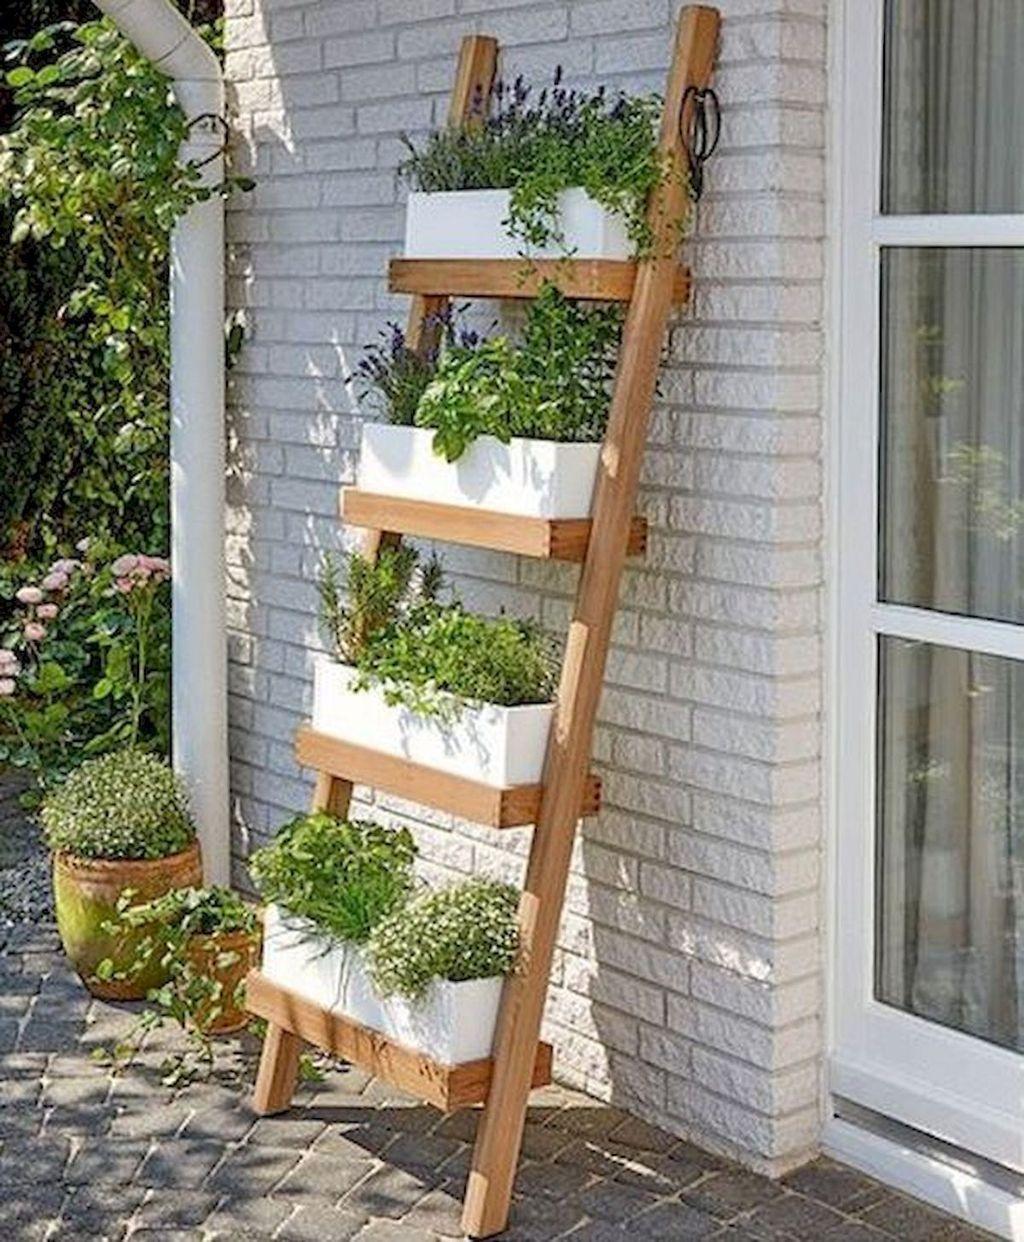 55 Top Inspiring Vertical Garden Design Ideas and Remodel ...